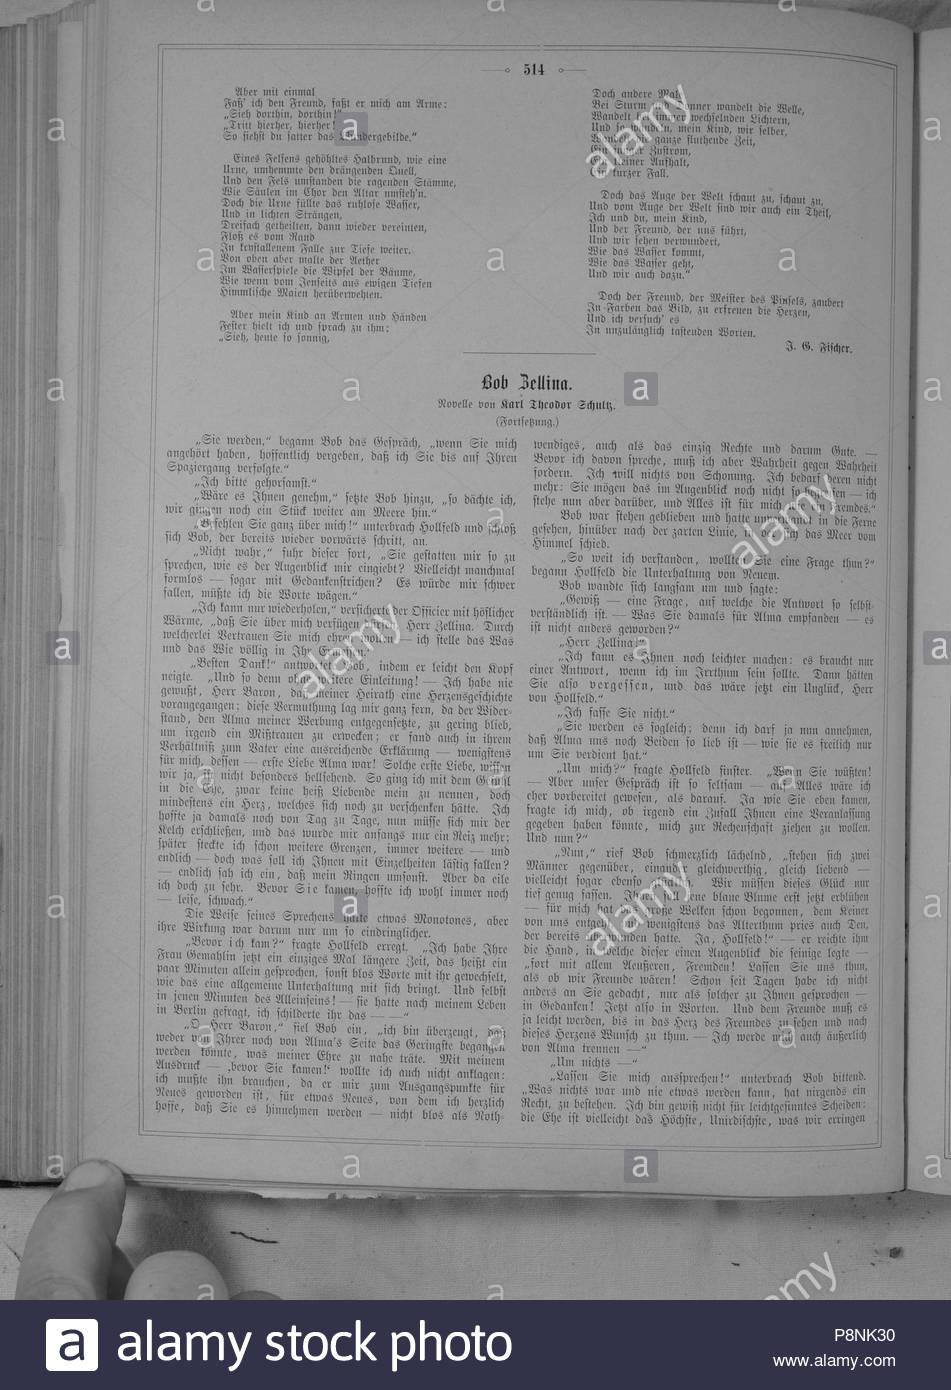 207 gartenlaube 1882 514 P8NK30